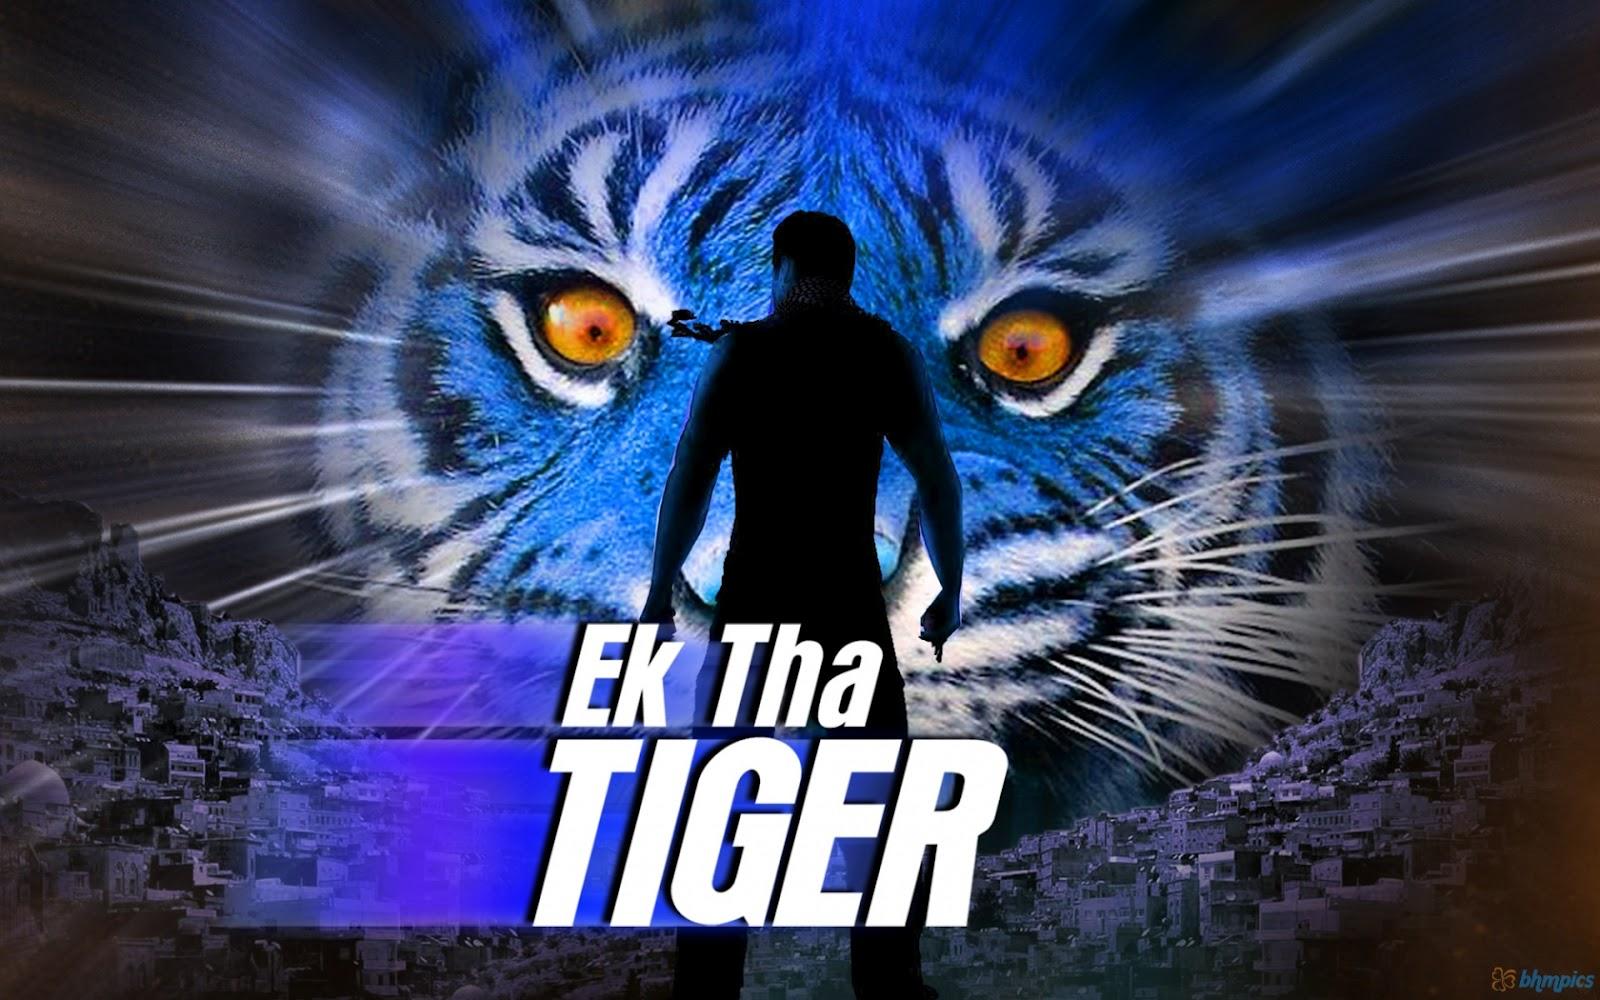 Download Full Movie Ek Tha Tiger In Hd 1080p lilidor ek_tha_tiger-1680x1050-11